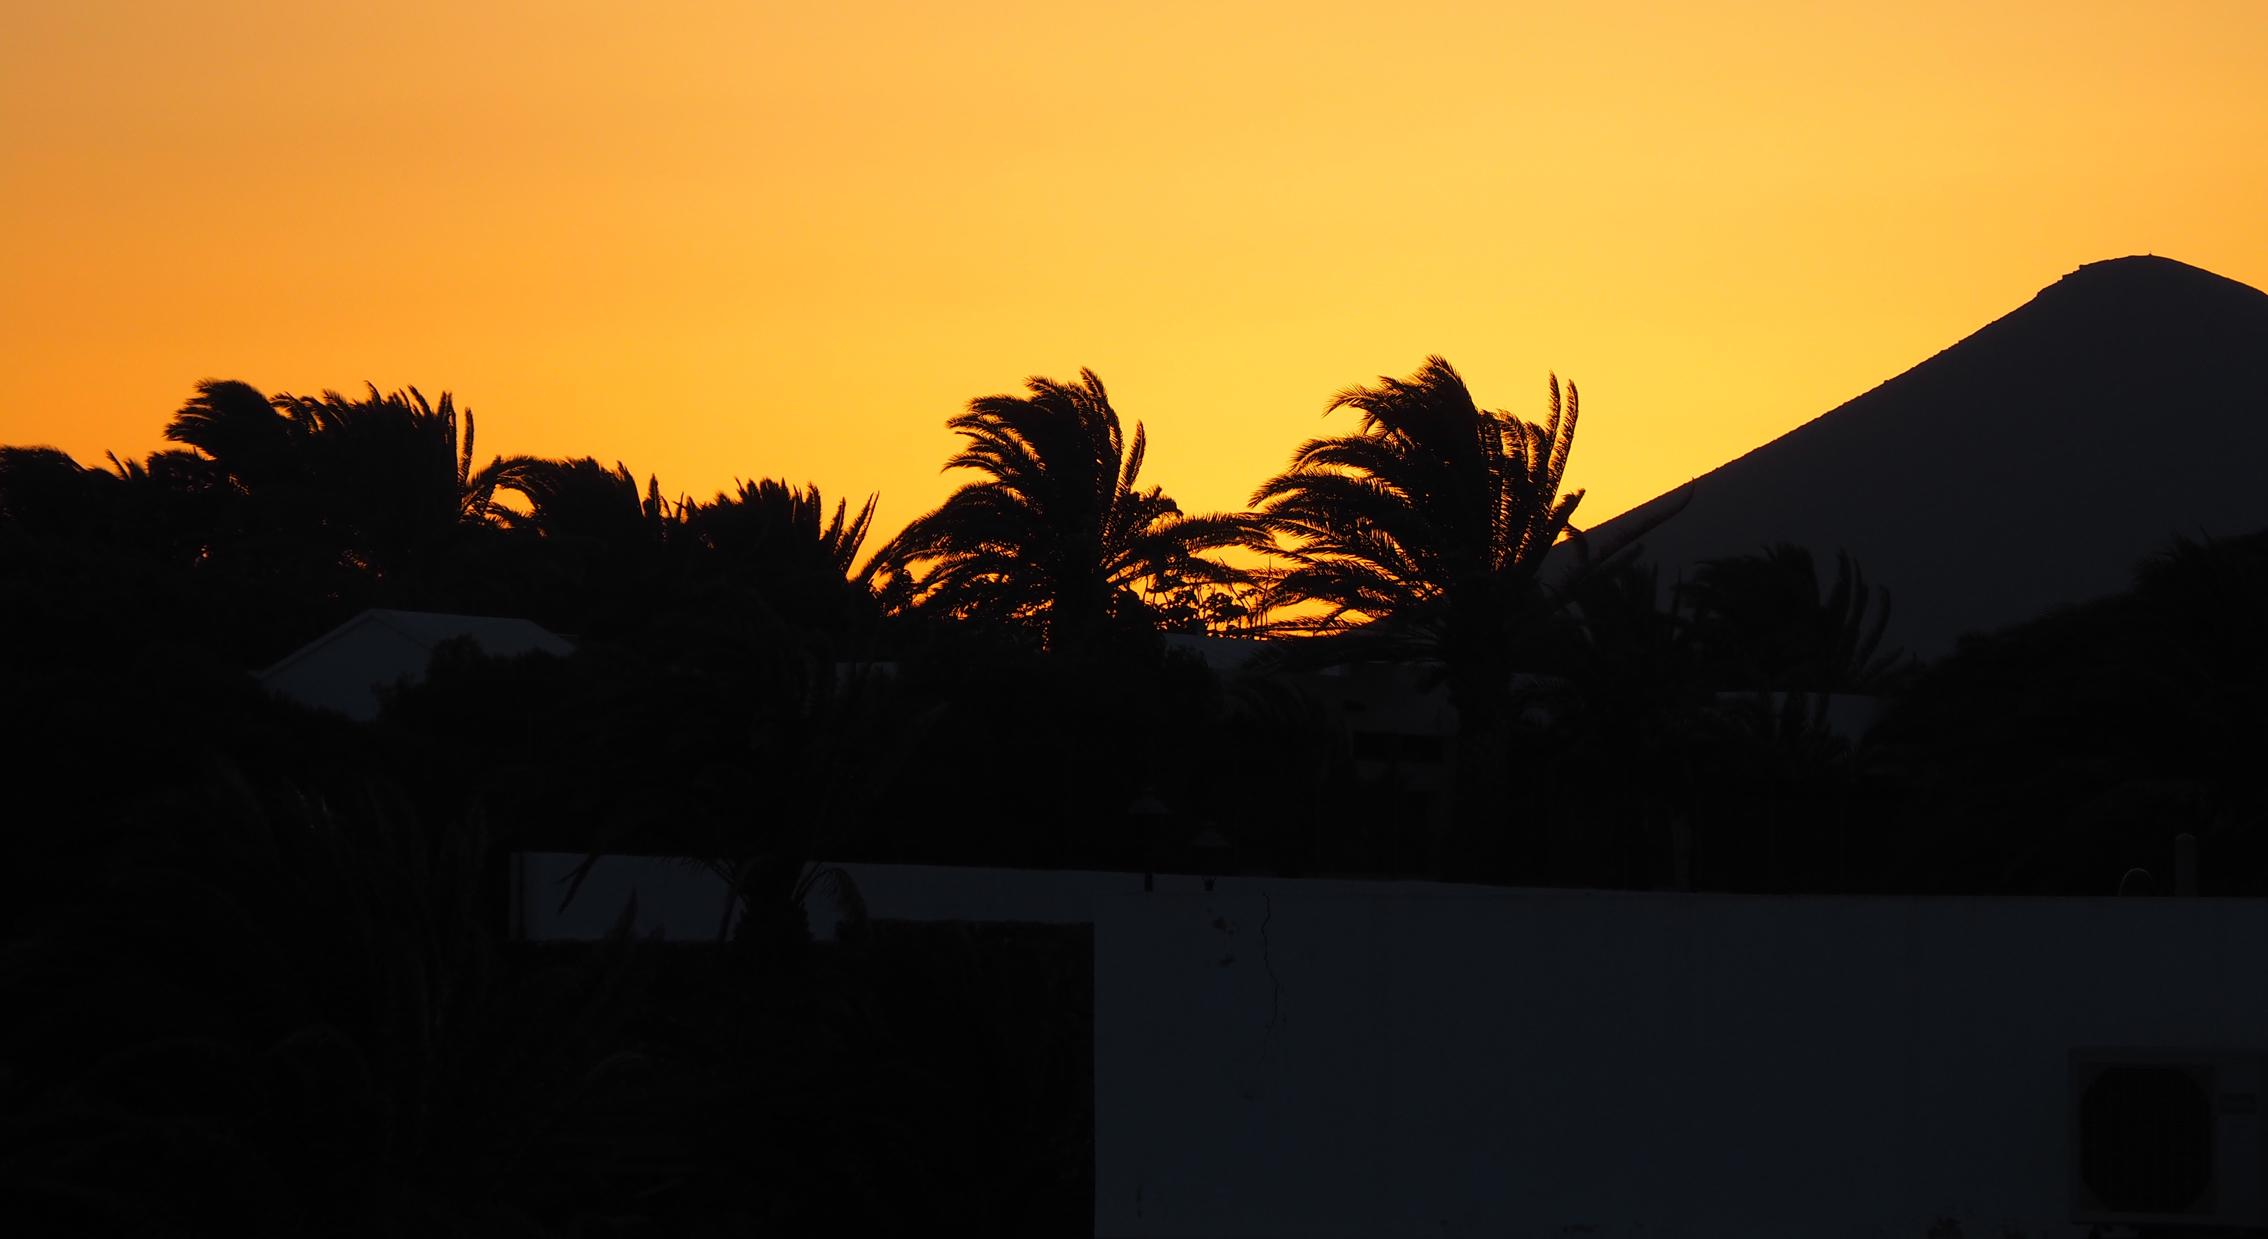 Lanzarote Costa Teguise Sonnenuntergang Ozeanien Tours